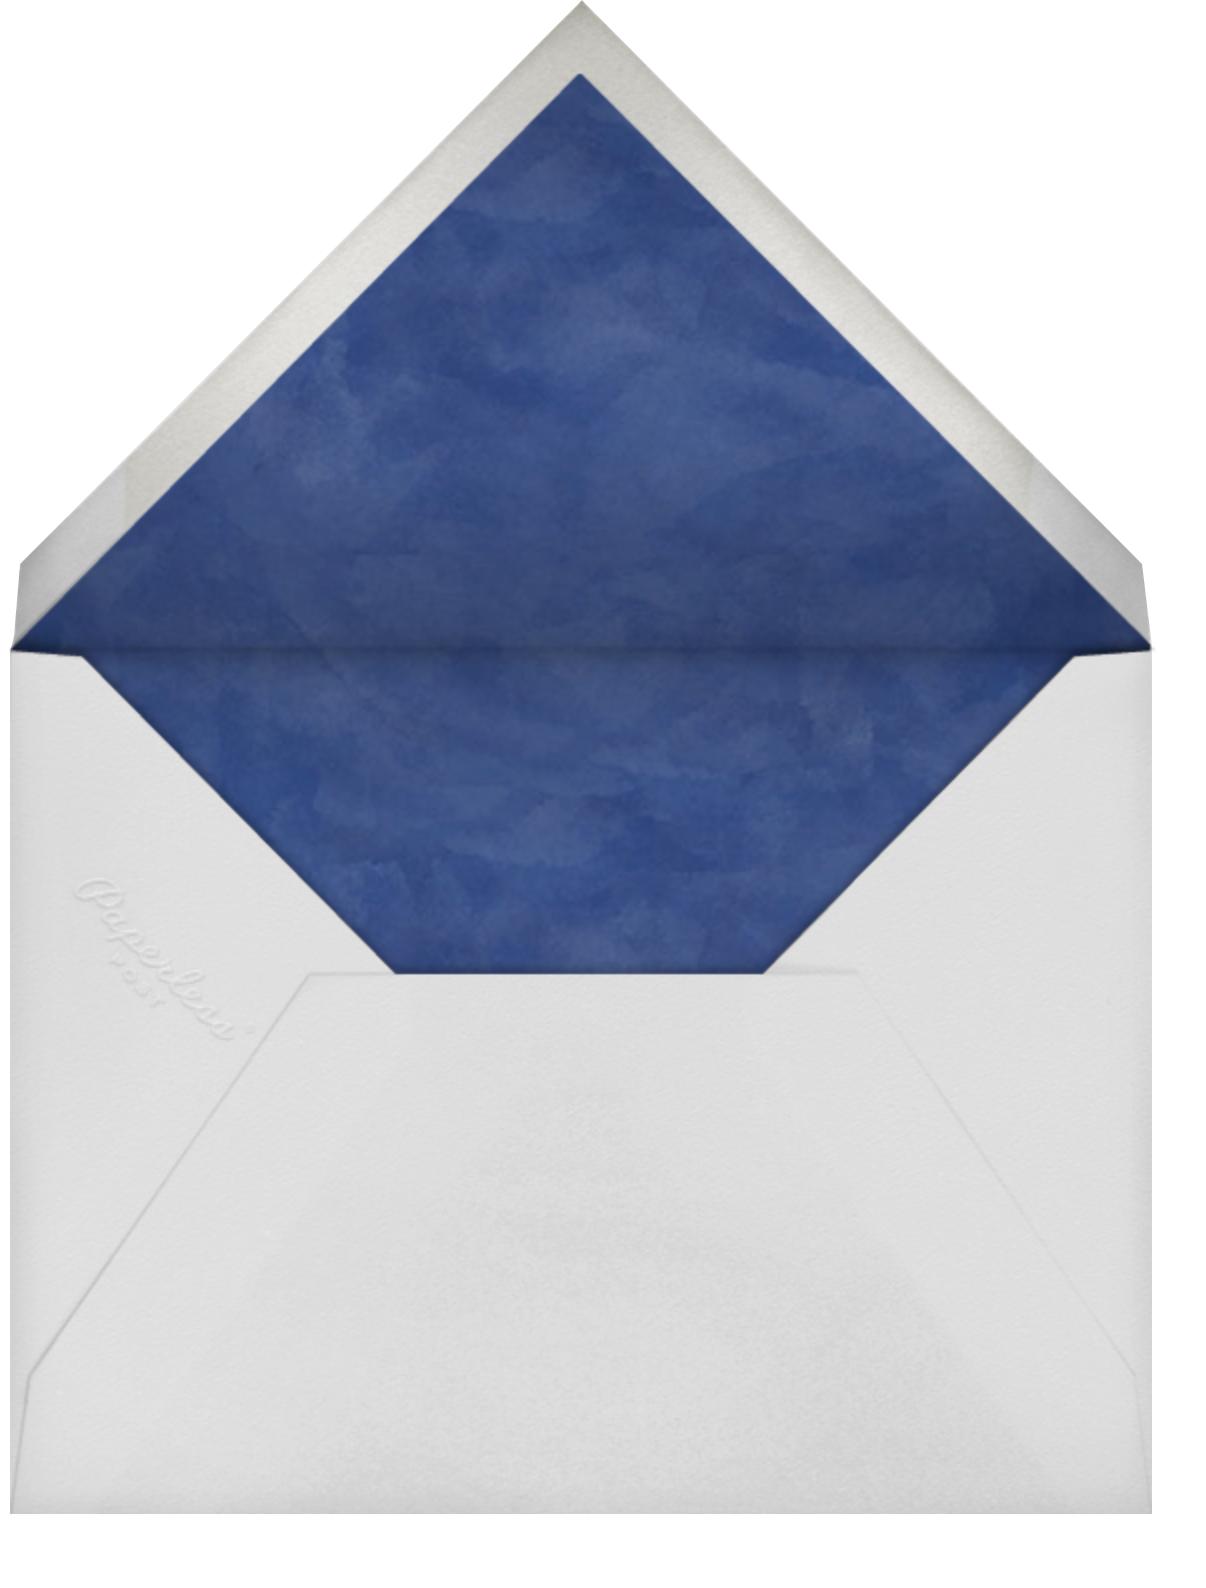 Floral Trellis II - Blue/White - Oscar de la Renta - All - envelope back